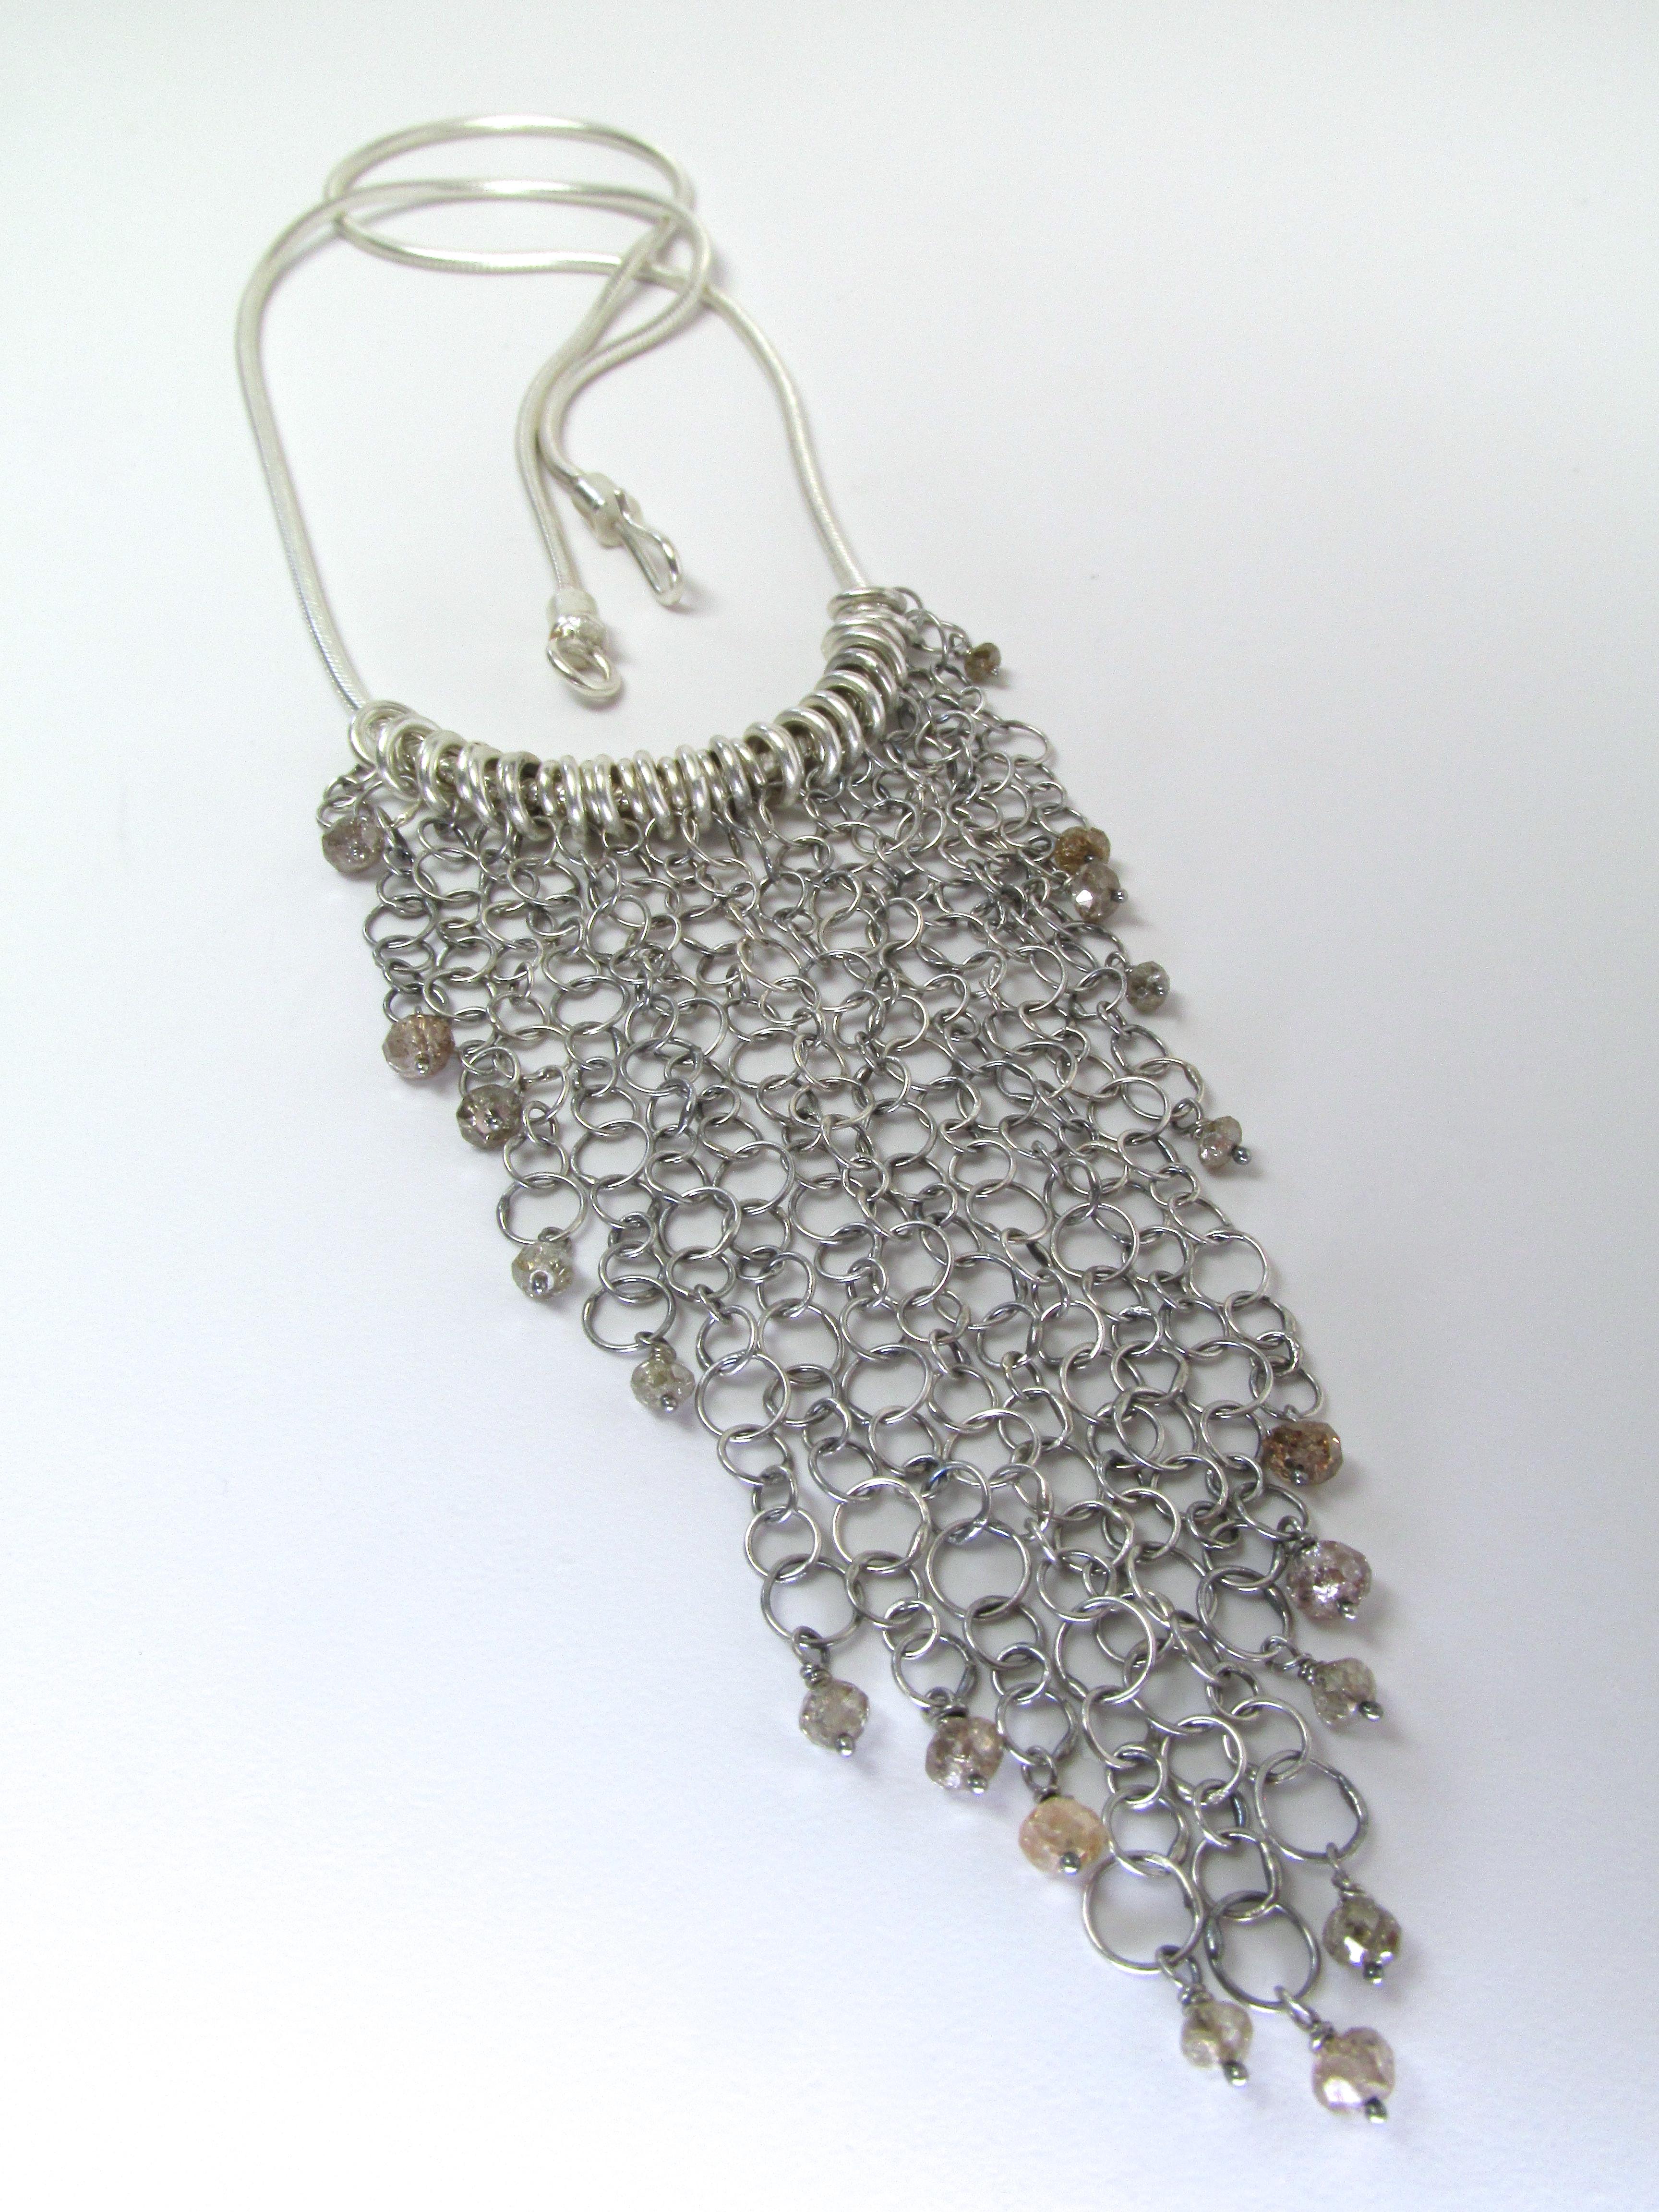 Handmade Chain With Diamond Beads